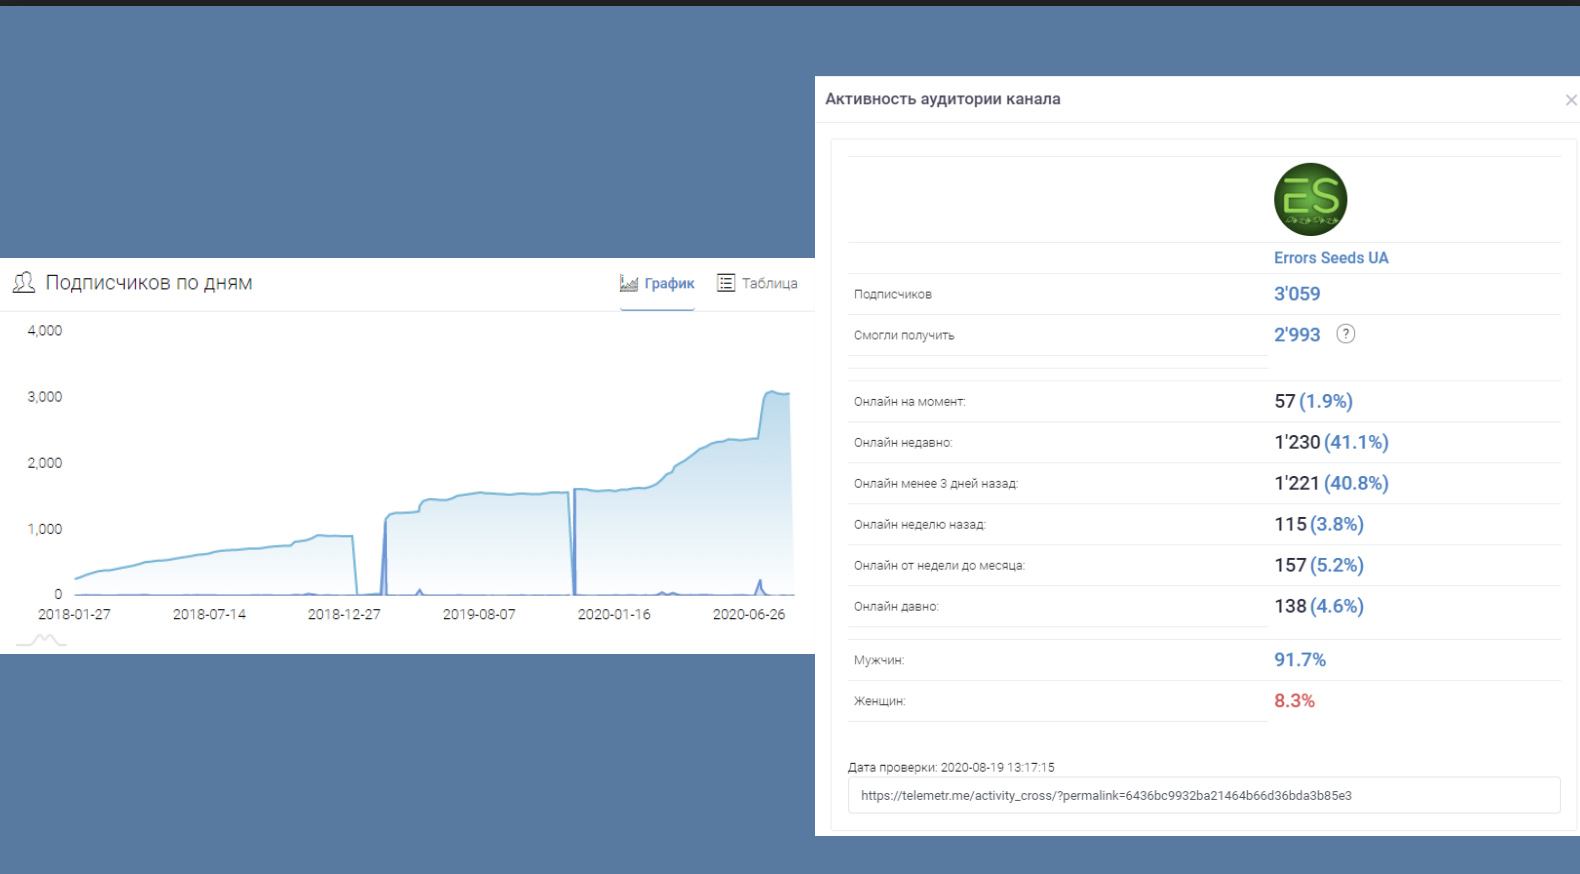 Количество подписчиков в сервисе Telemetr